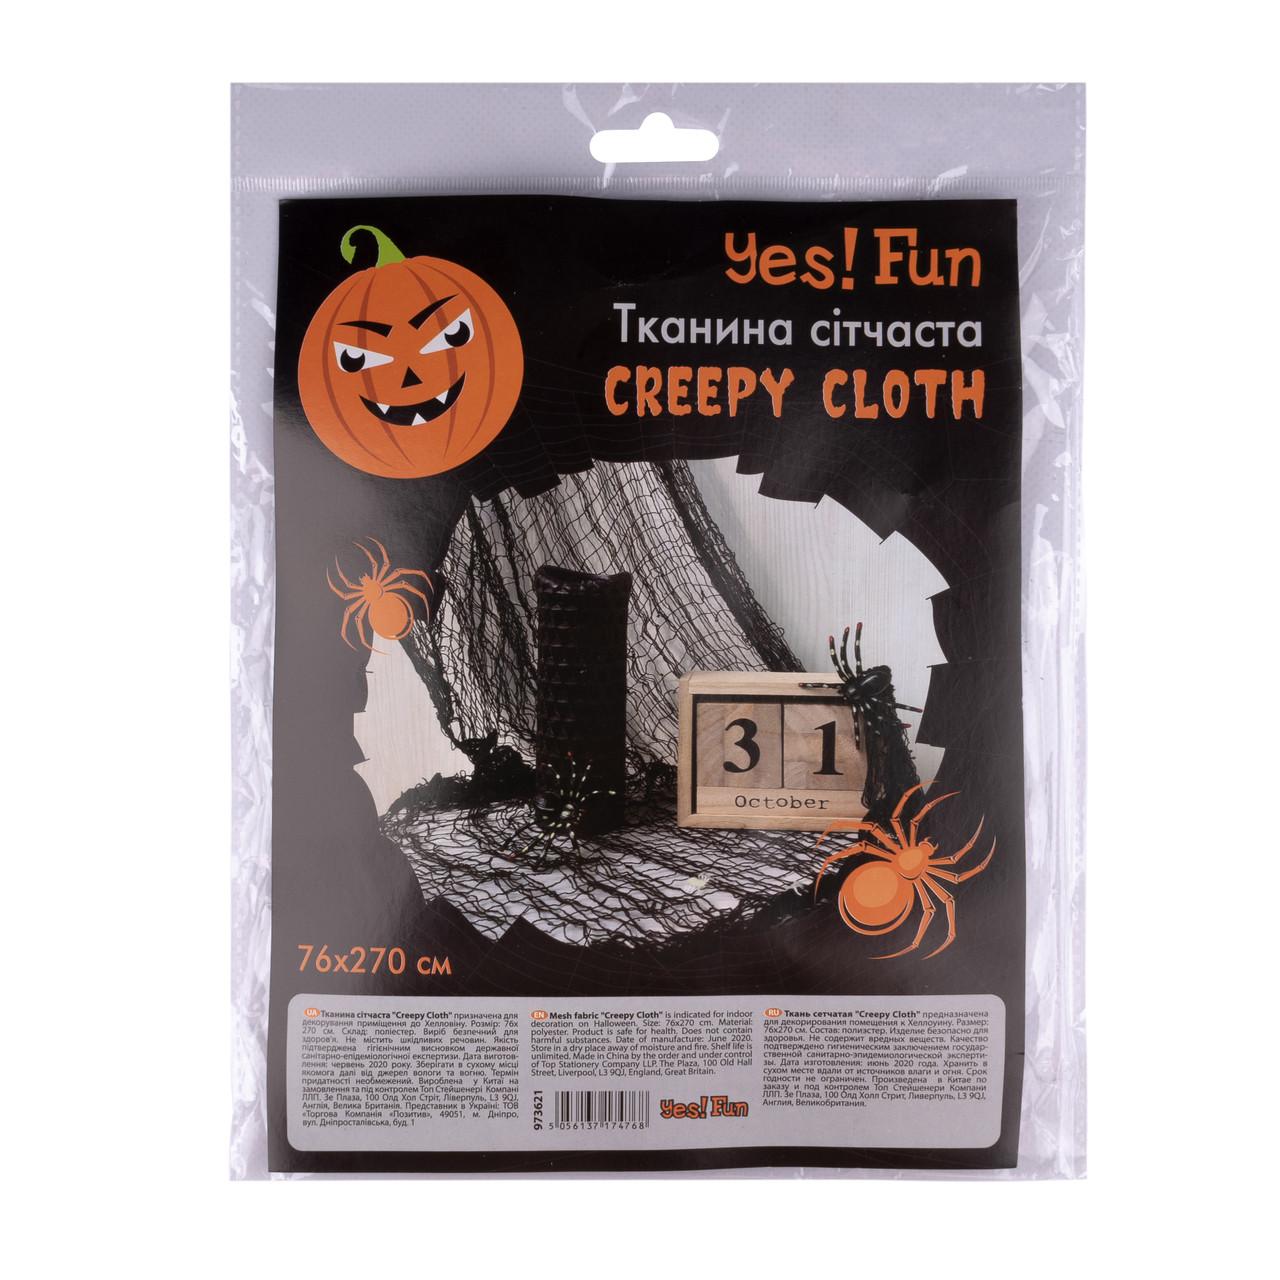 "Тканина сітчаста Yes! Fun ""Creepy cloth"", 76х270см, черная"